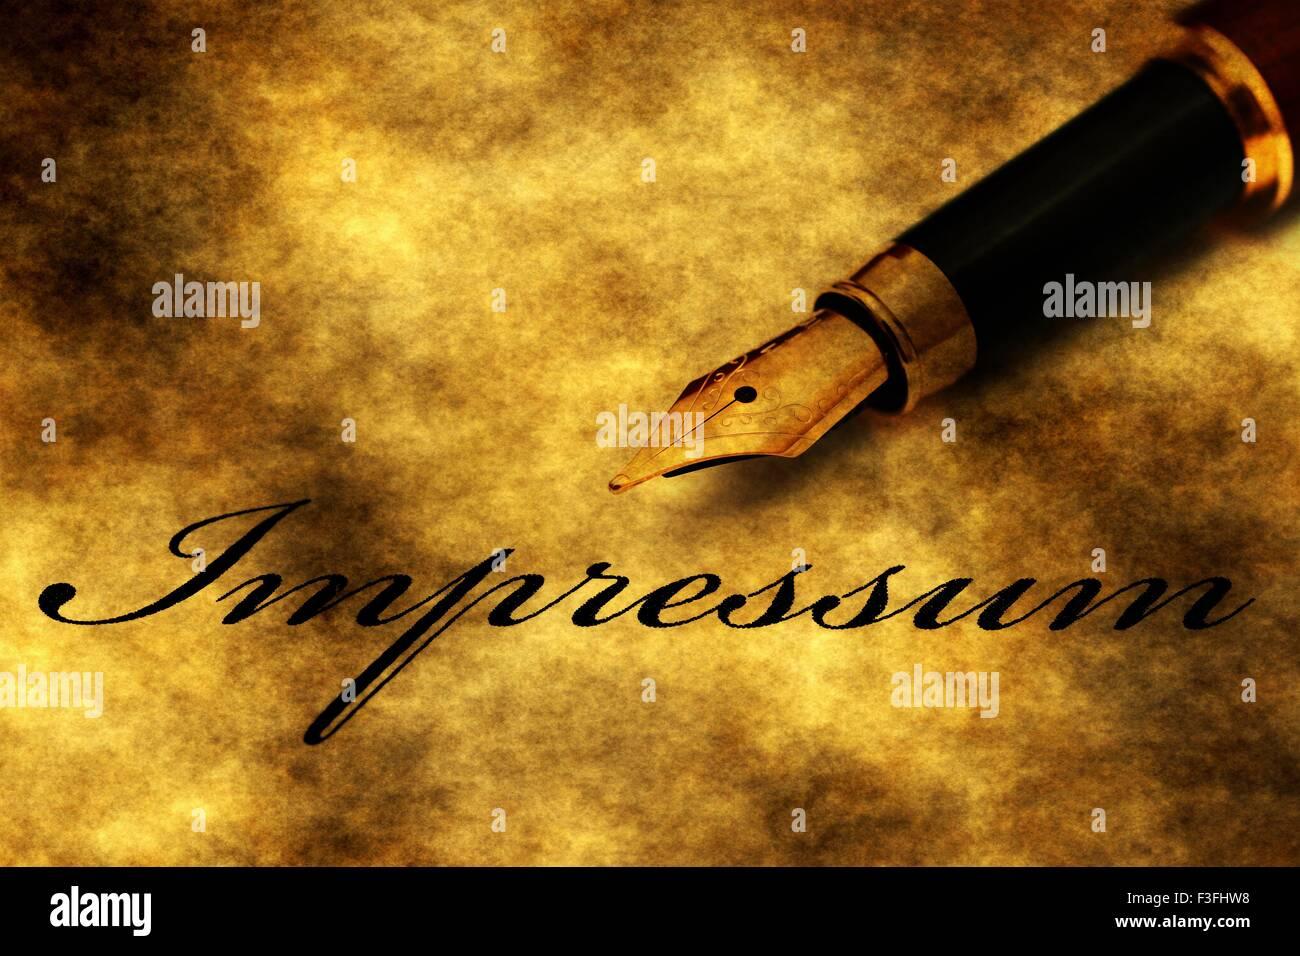 Fountain pen on impressum - Stock Image